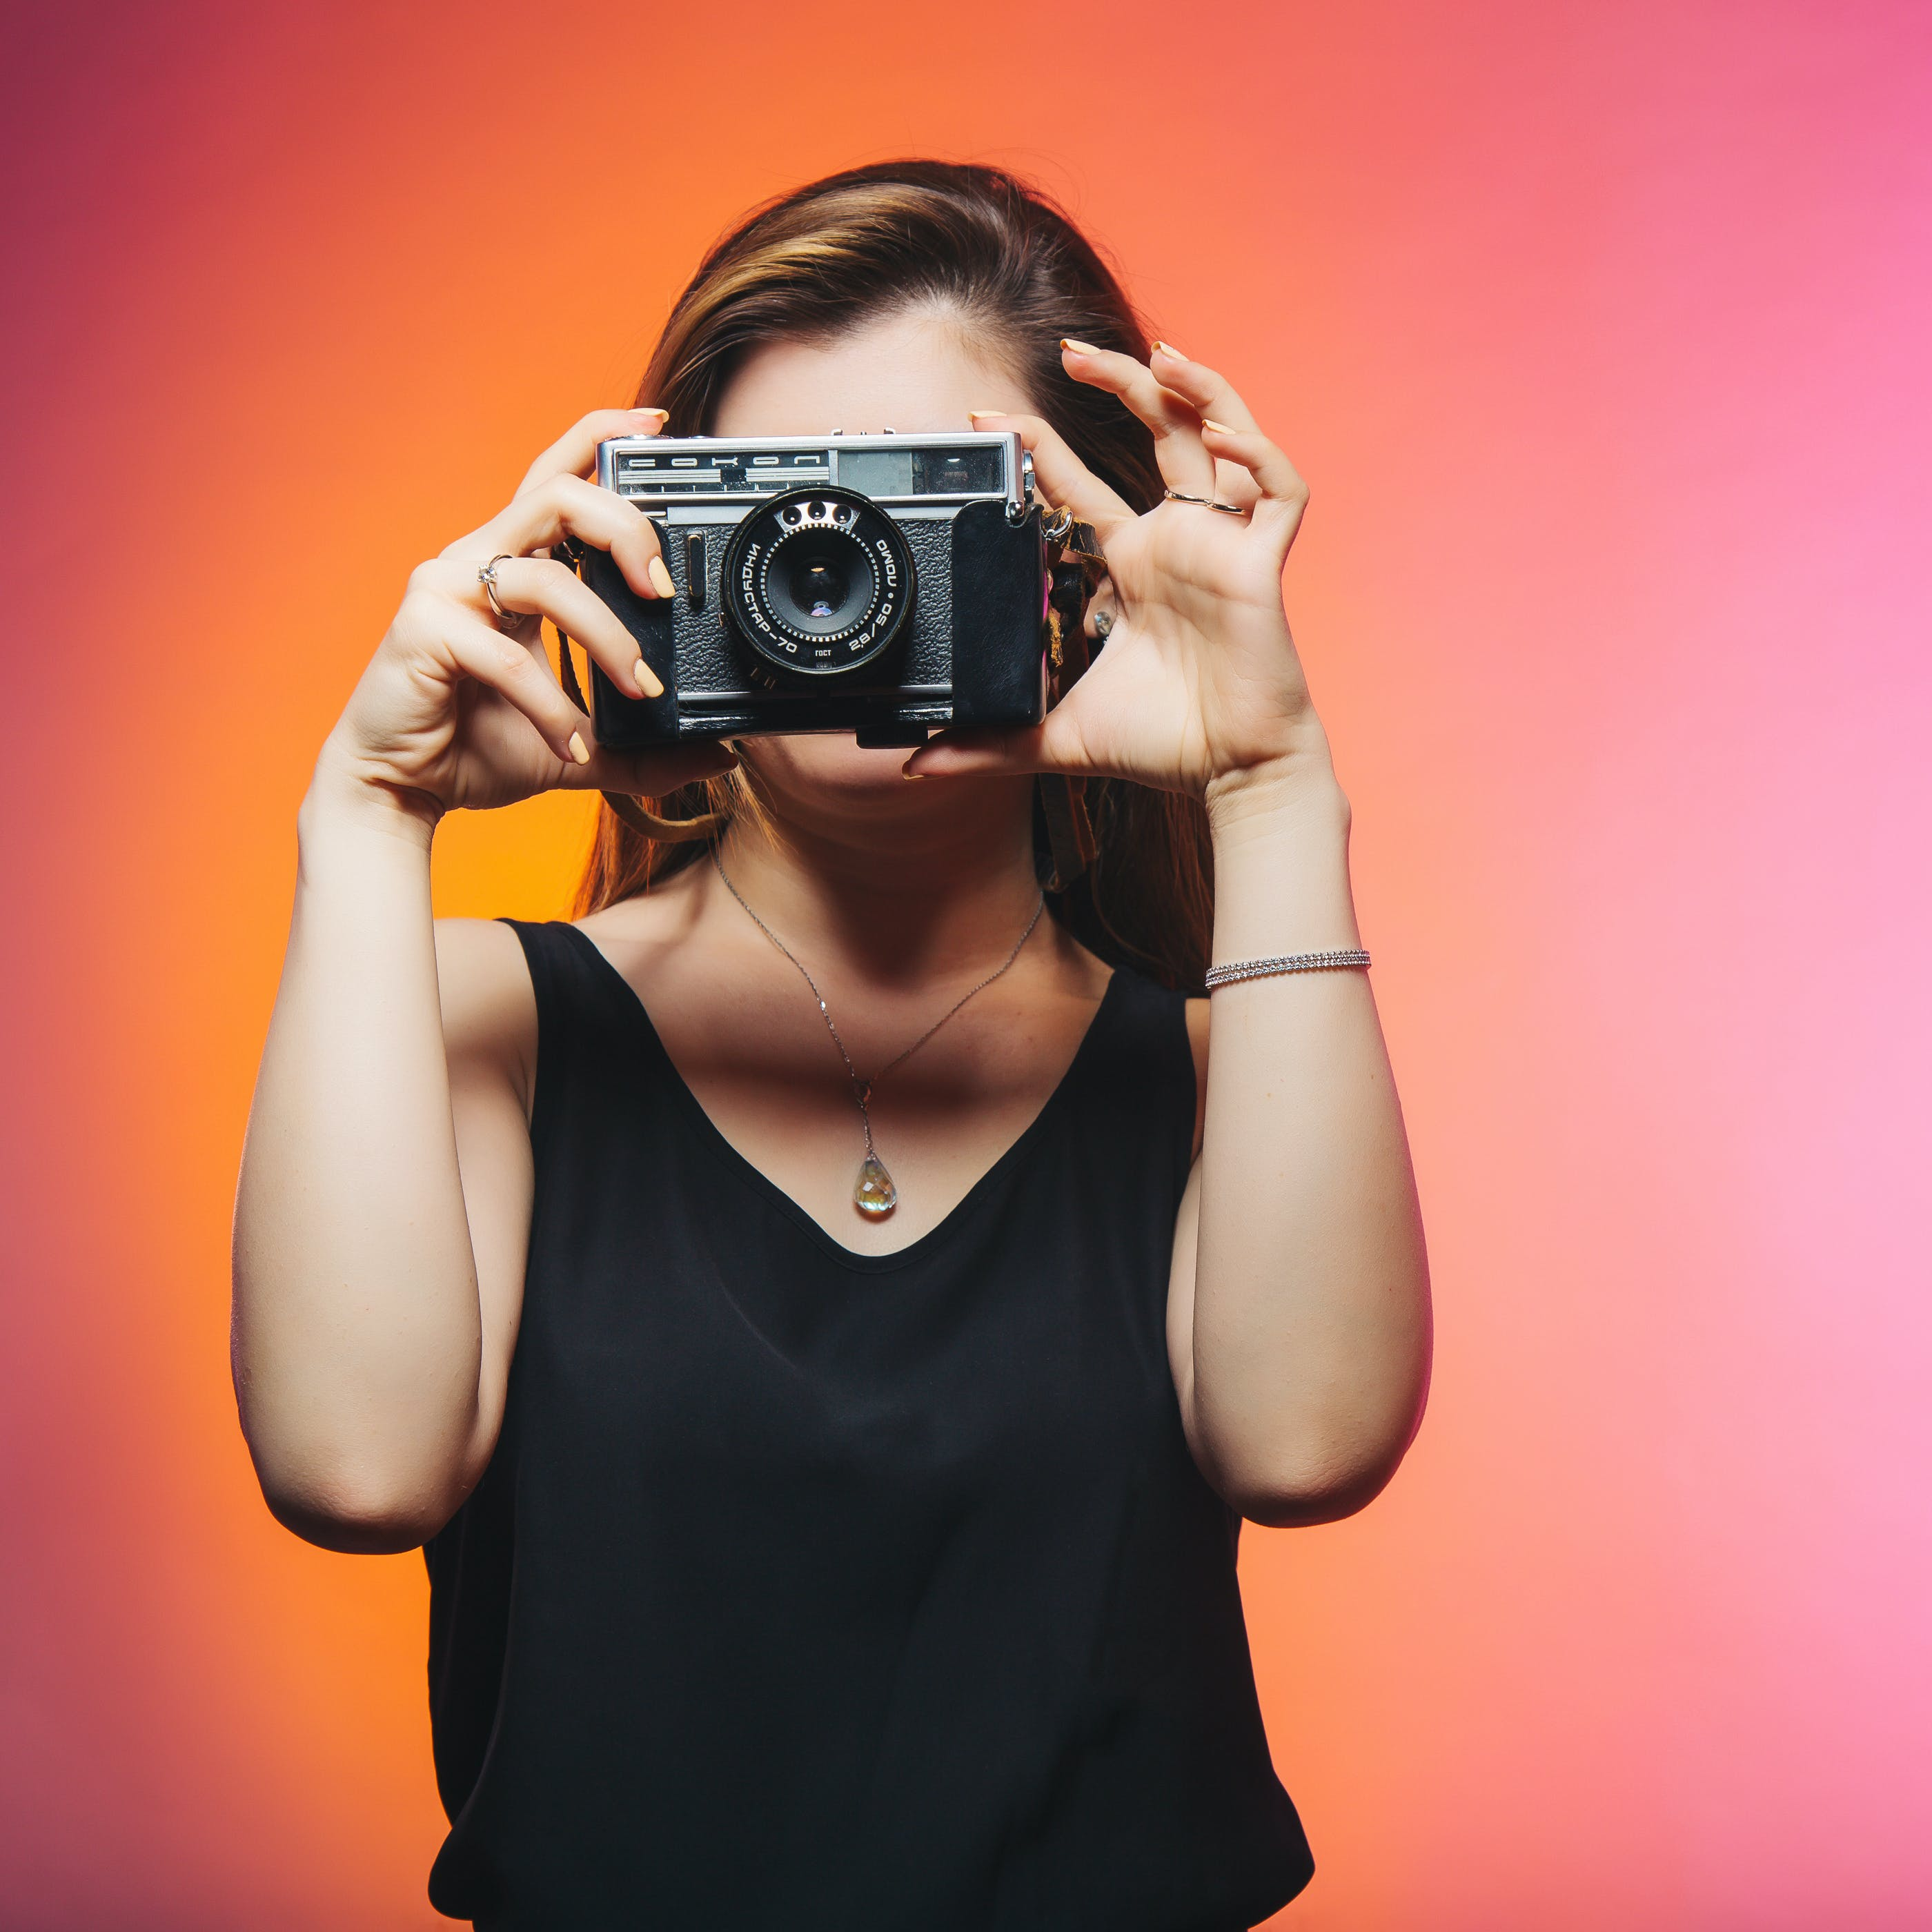 Woman Wearing Black Sleeveless Top Holding Gray Camera